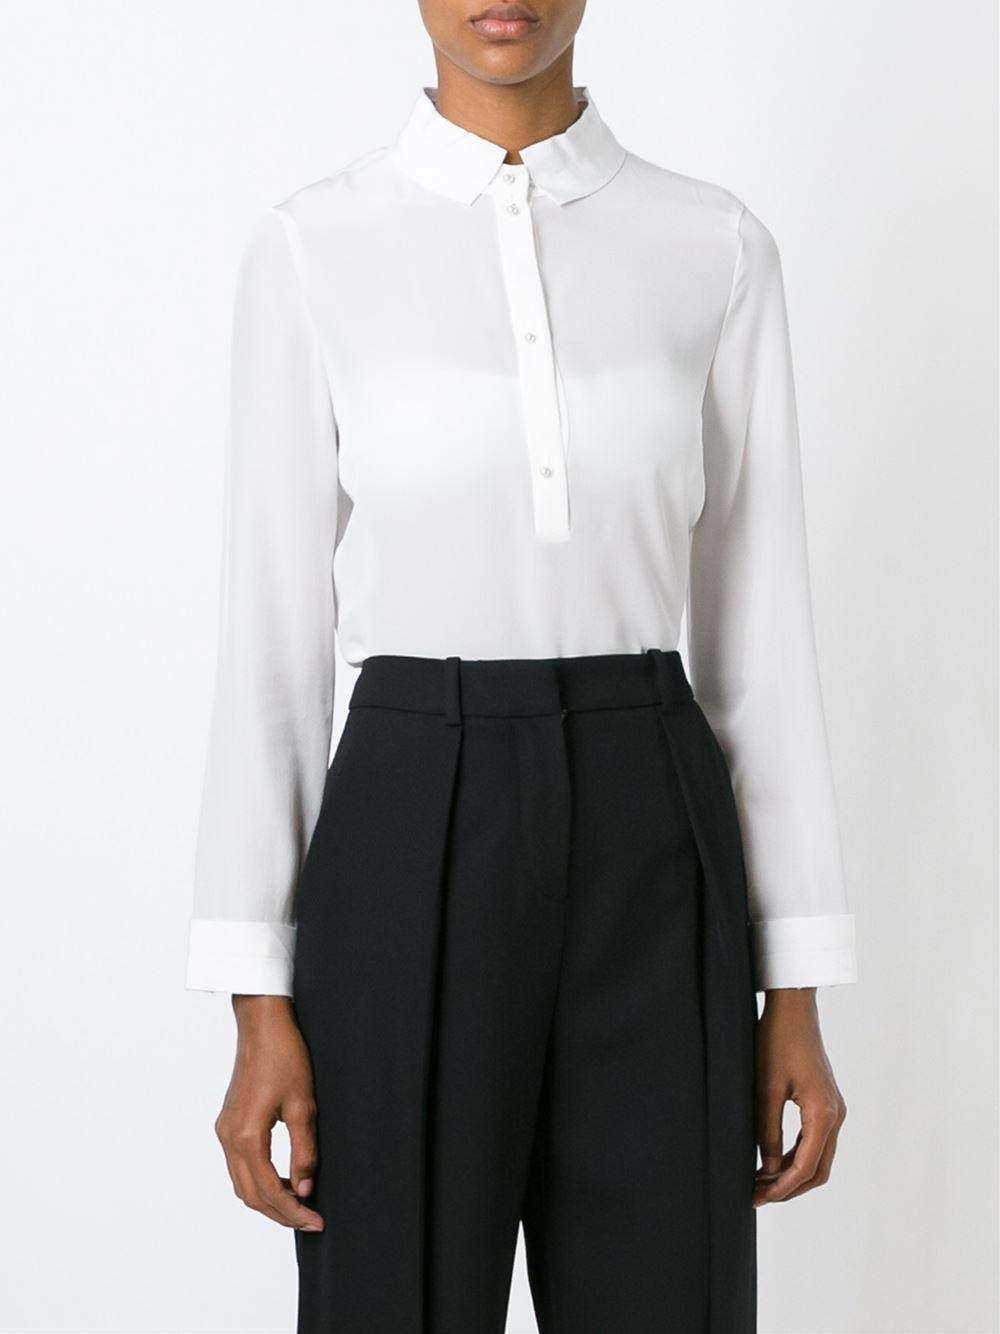 Armani White Silk Blouse